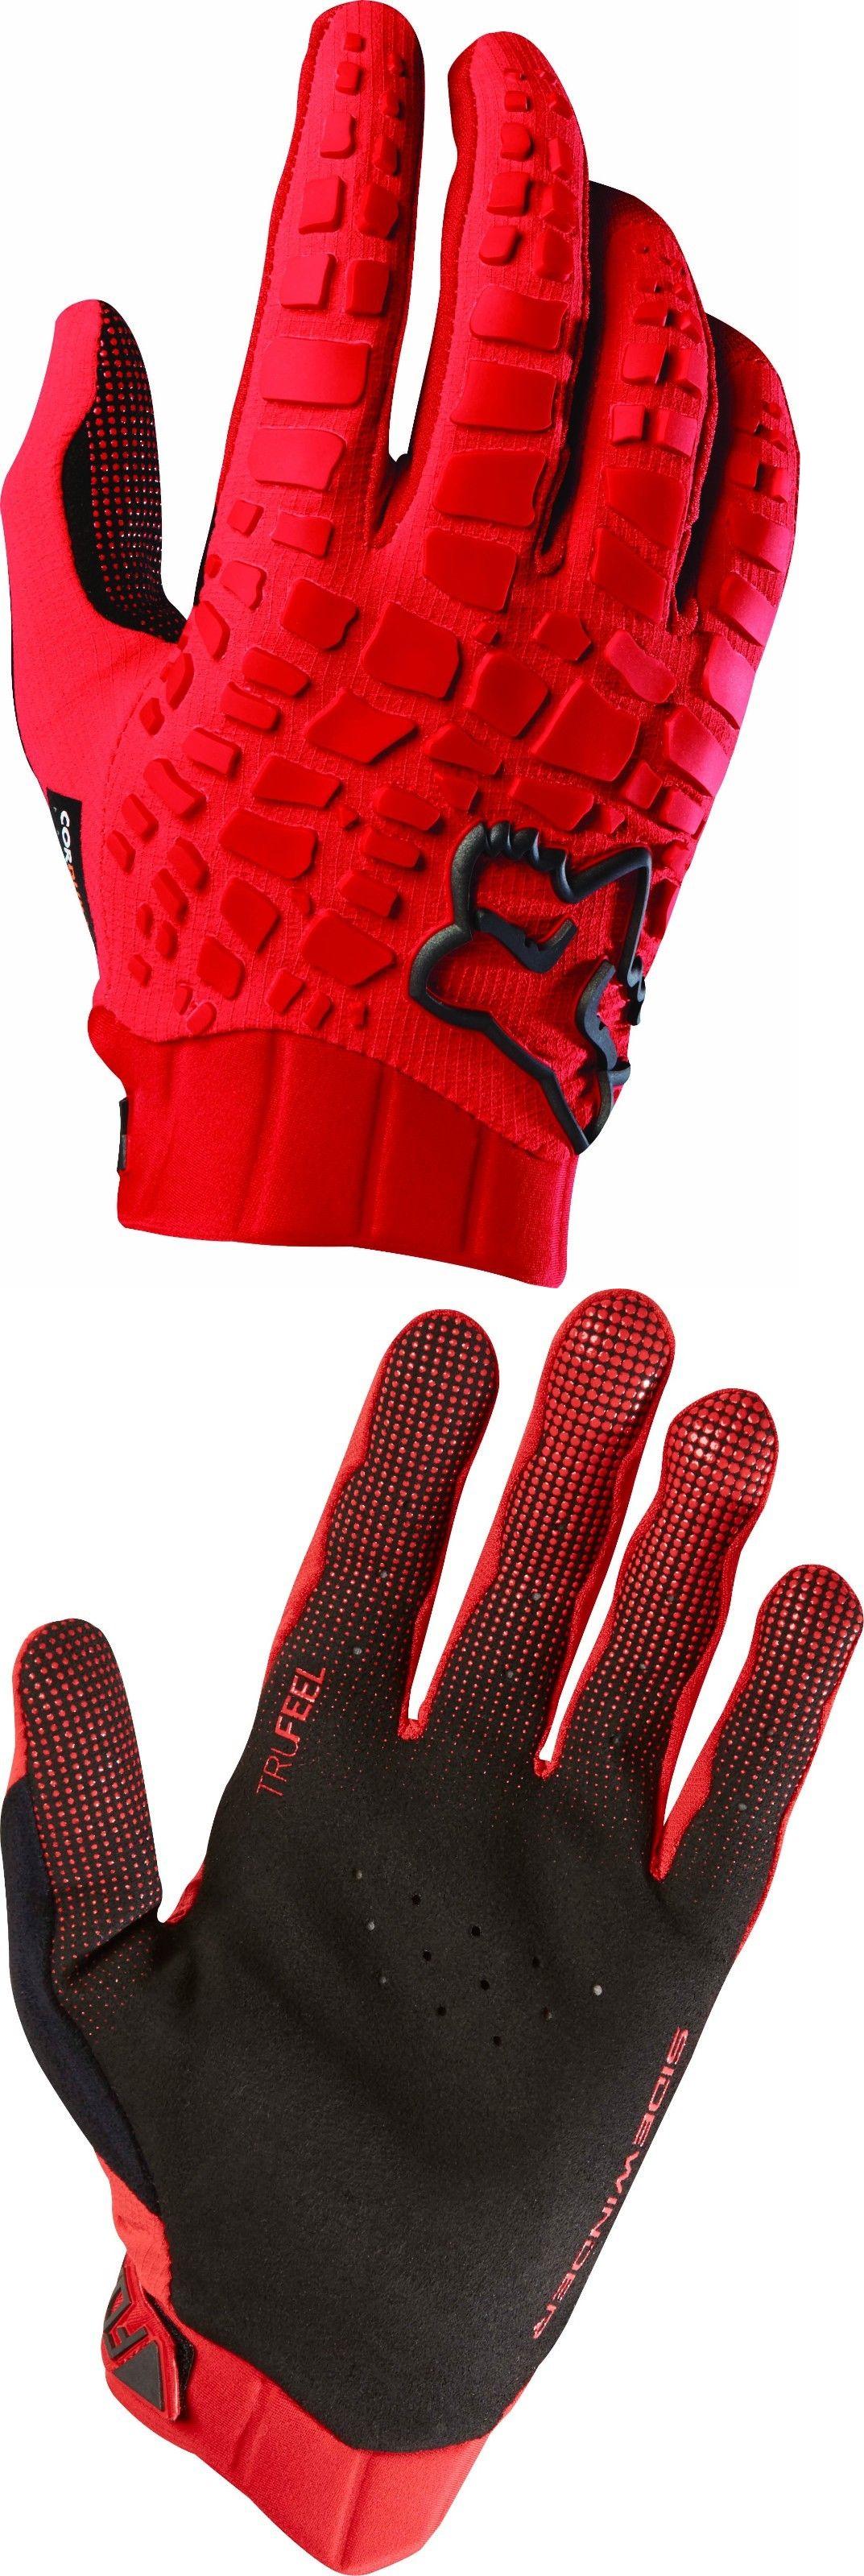 Gloves fox racing sidewinder glove red ue buy it now